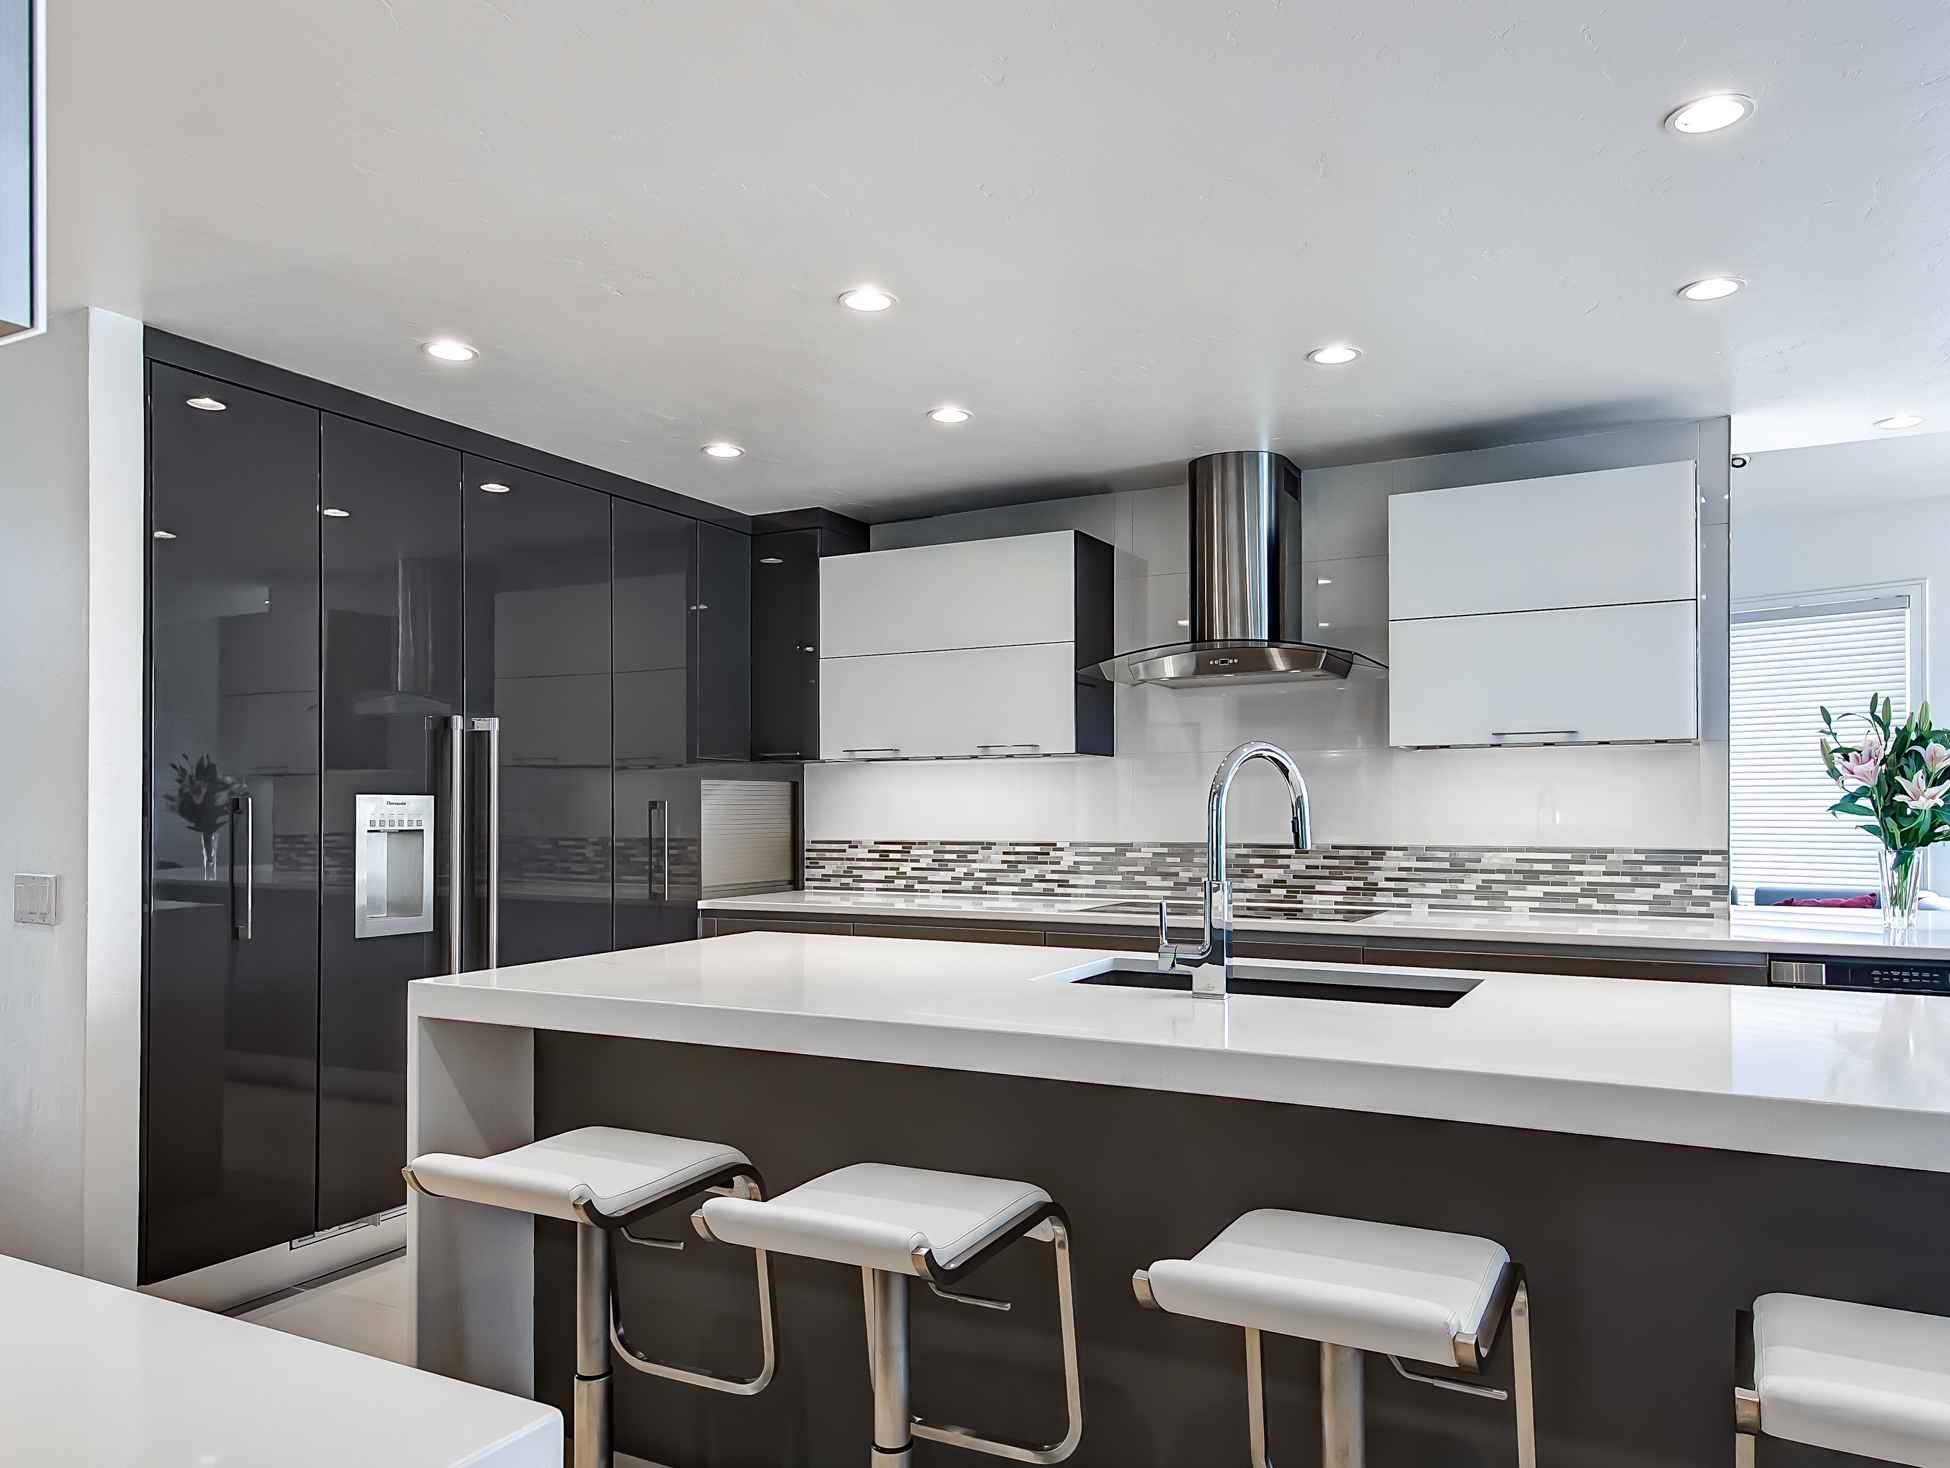 boulder modern — sanctuary kitchen and bath design-2.jpg